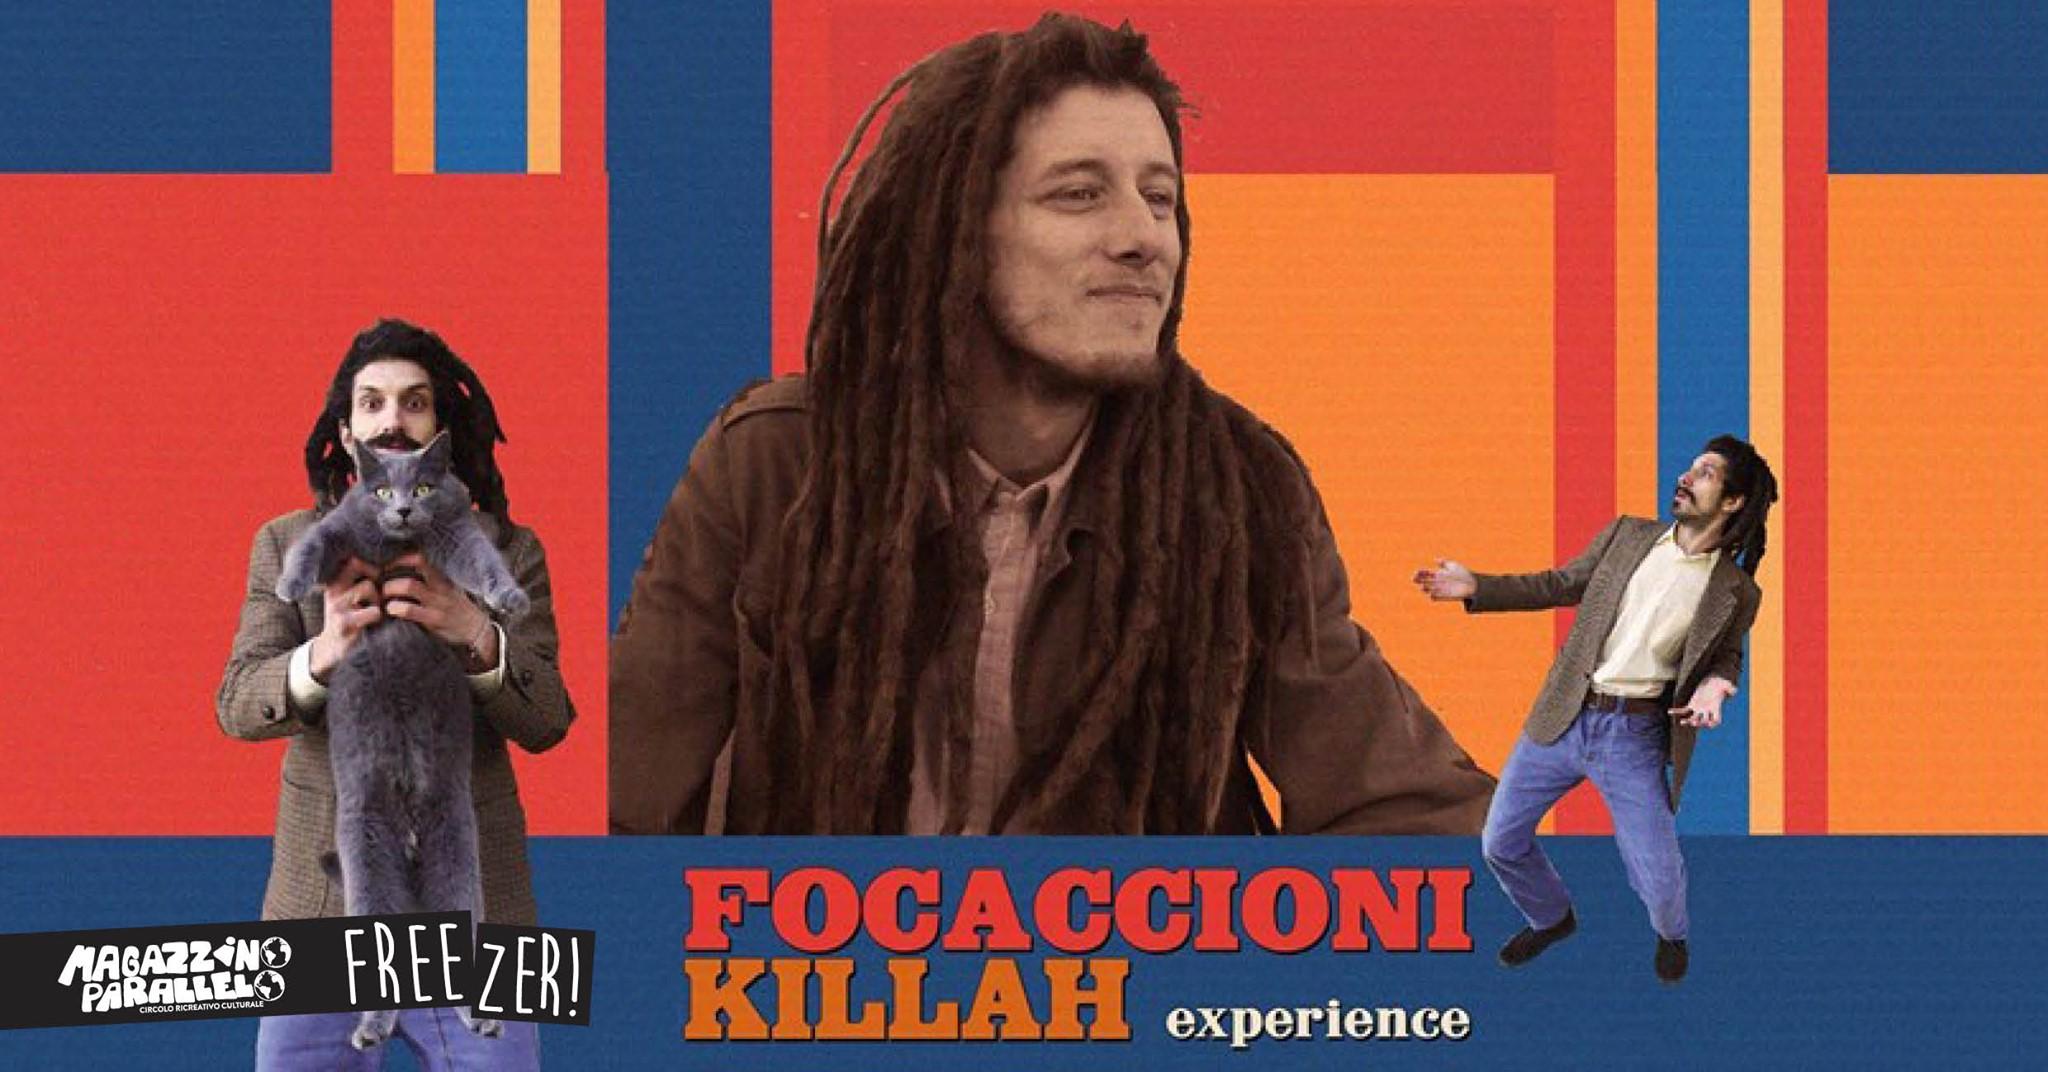 Focaccioni Killah experience / at Freezer!